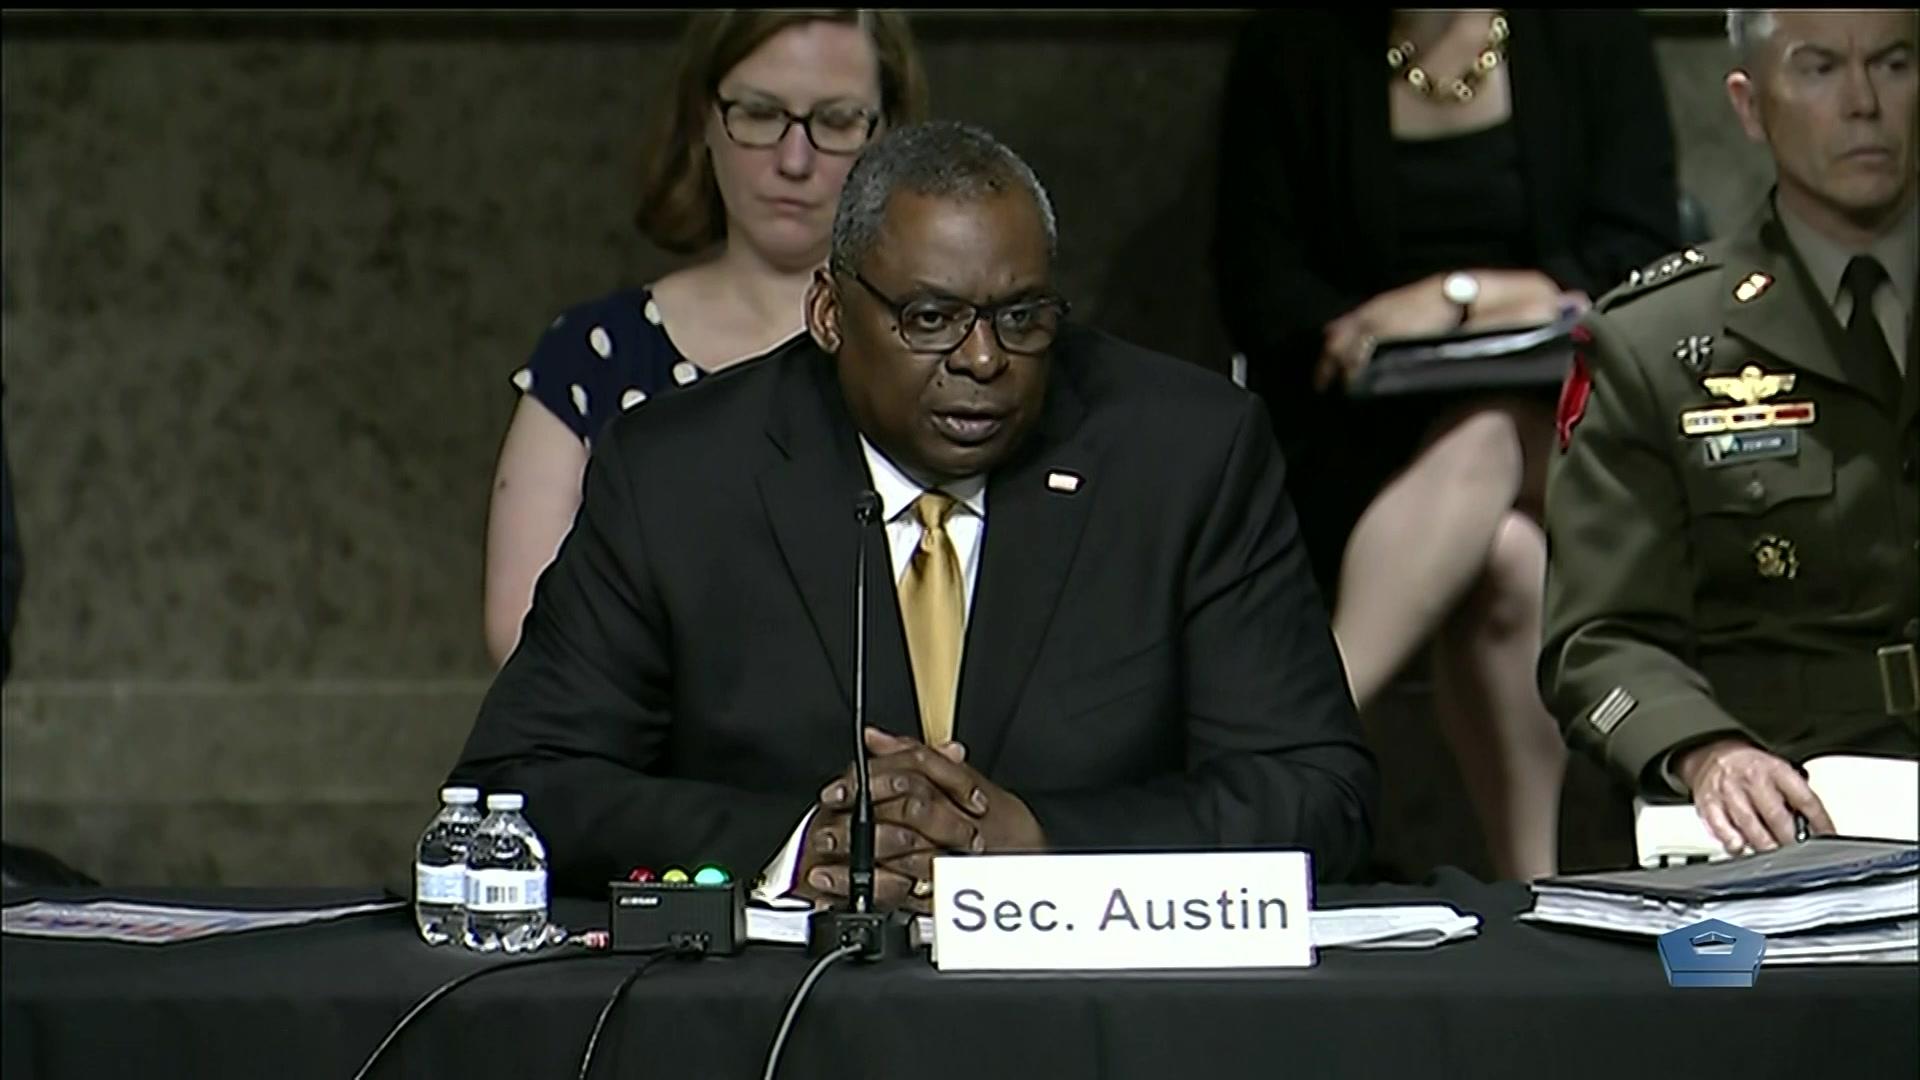 Secretary of Defense Lloyd J. Austin III sits and speaks at a table.